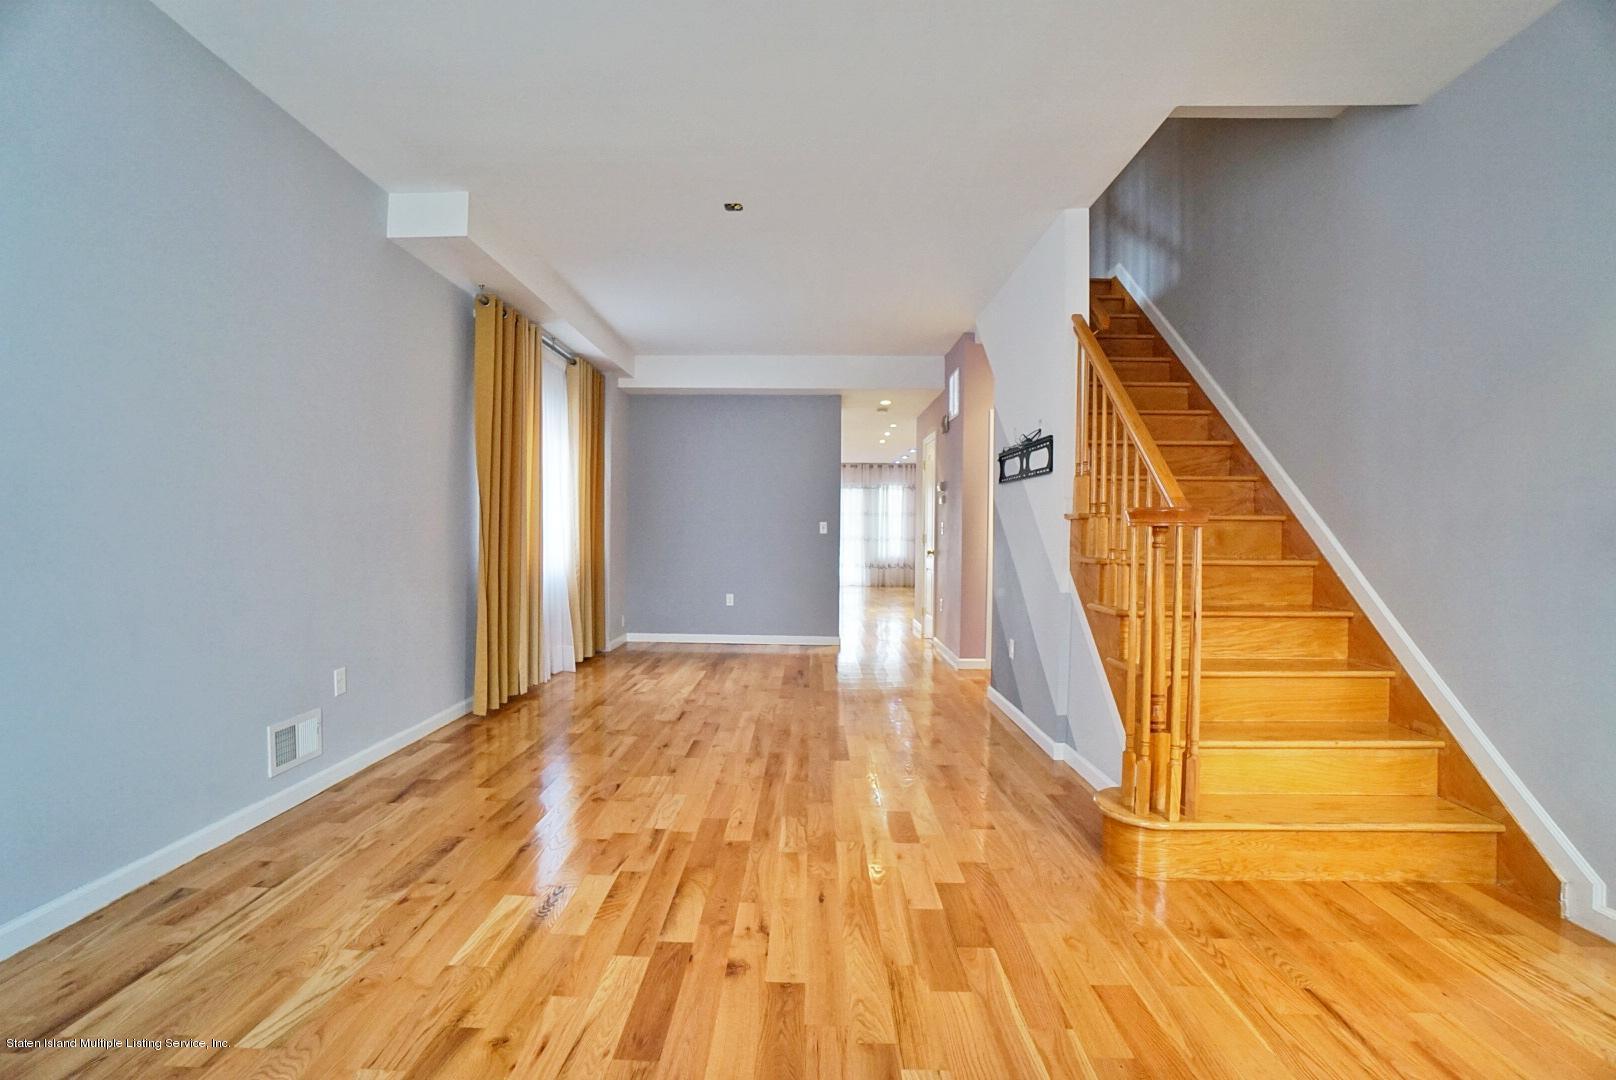 Single Family - Detached 311 Norway Avenue  Staten Island, NY 10305, MLS-1132870-2